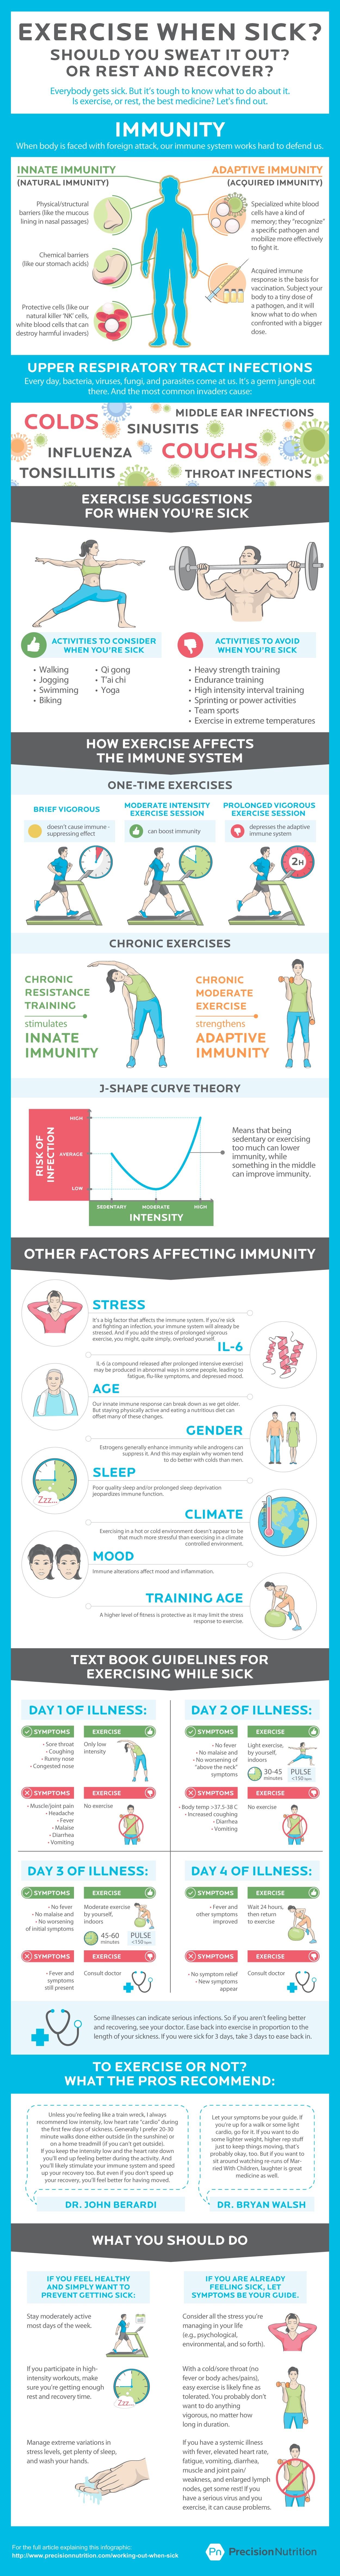 precision-nutrition-exercise-when-sick.jpg